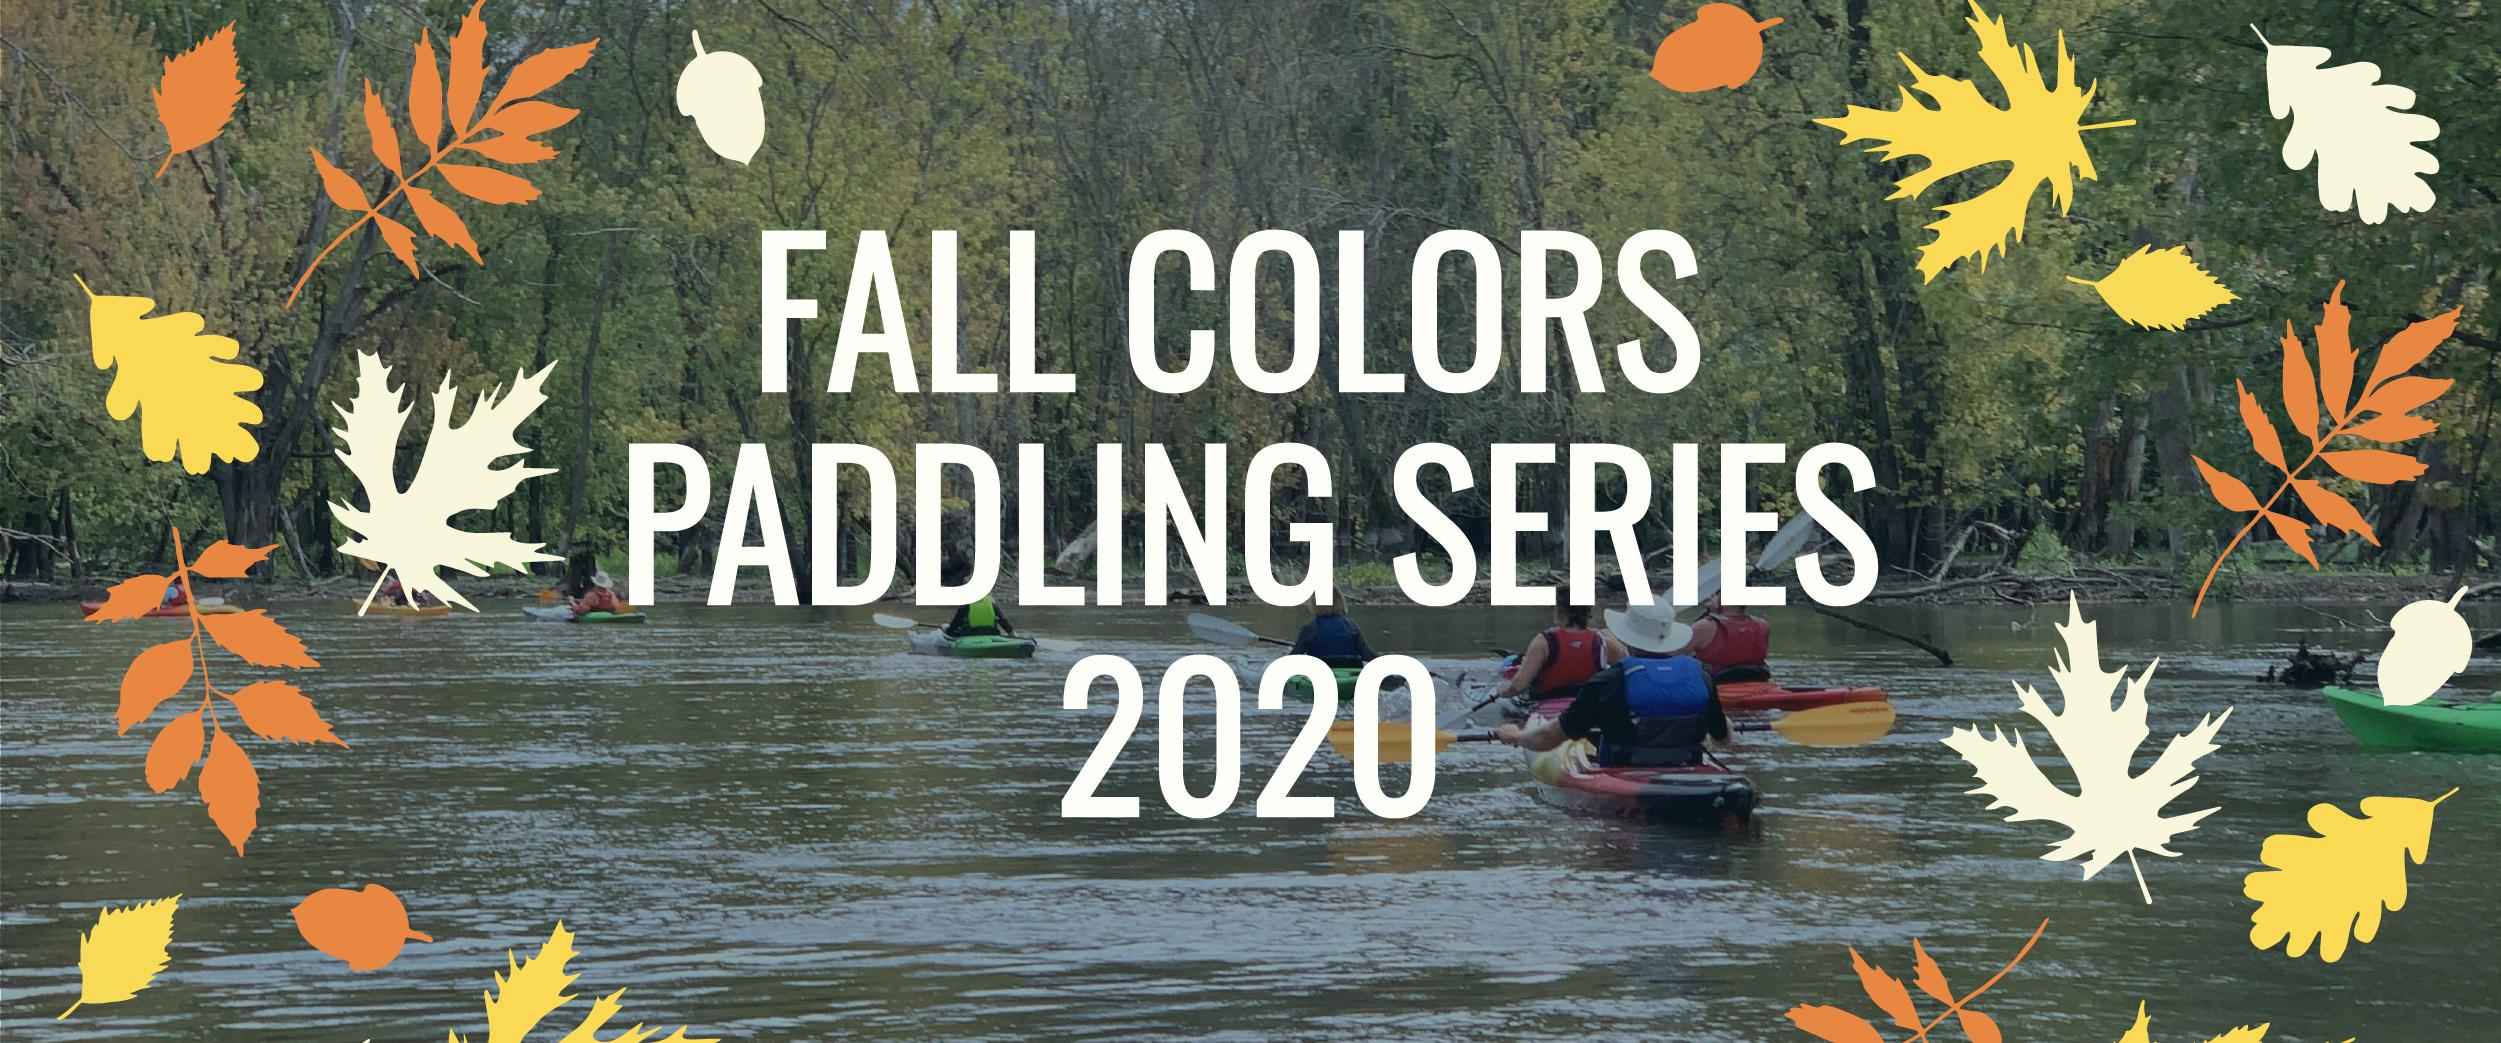 Rocktown Adventures | 2020 Fall Colors Paddling Series